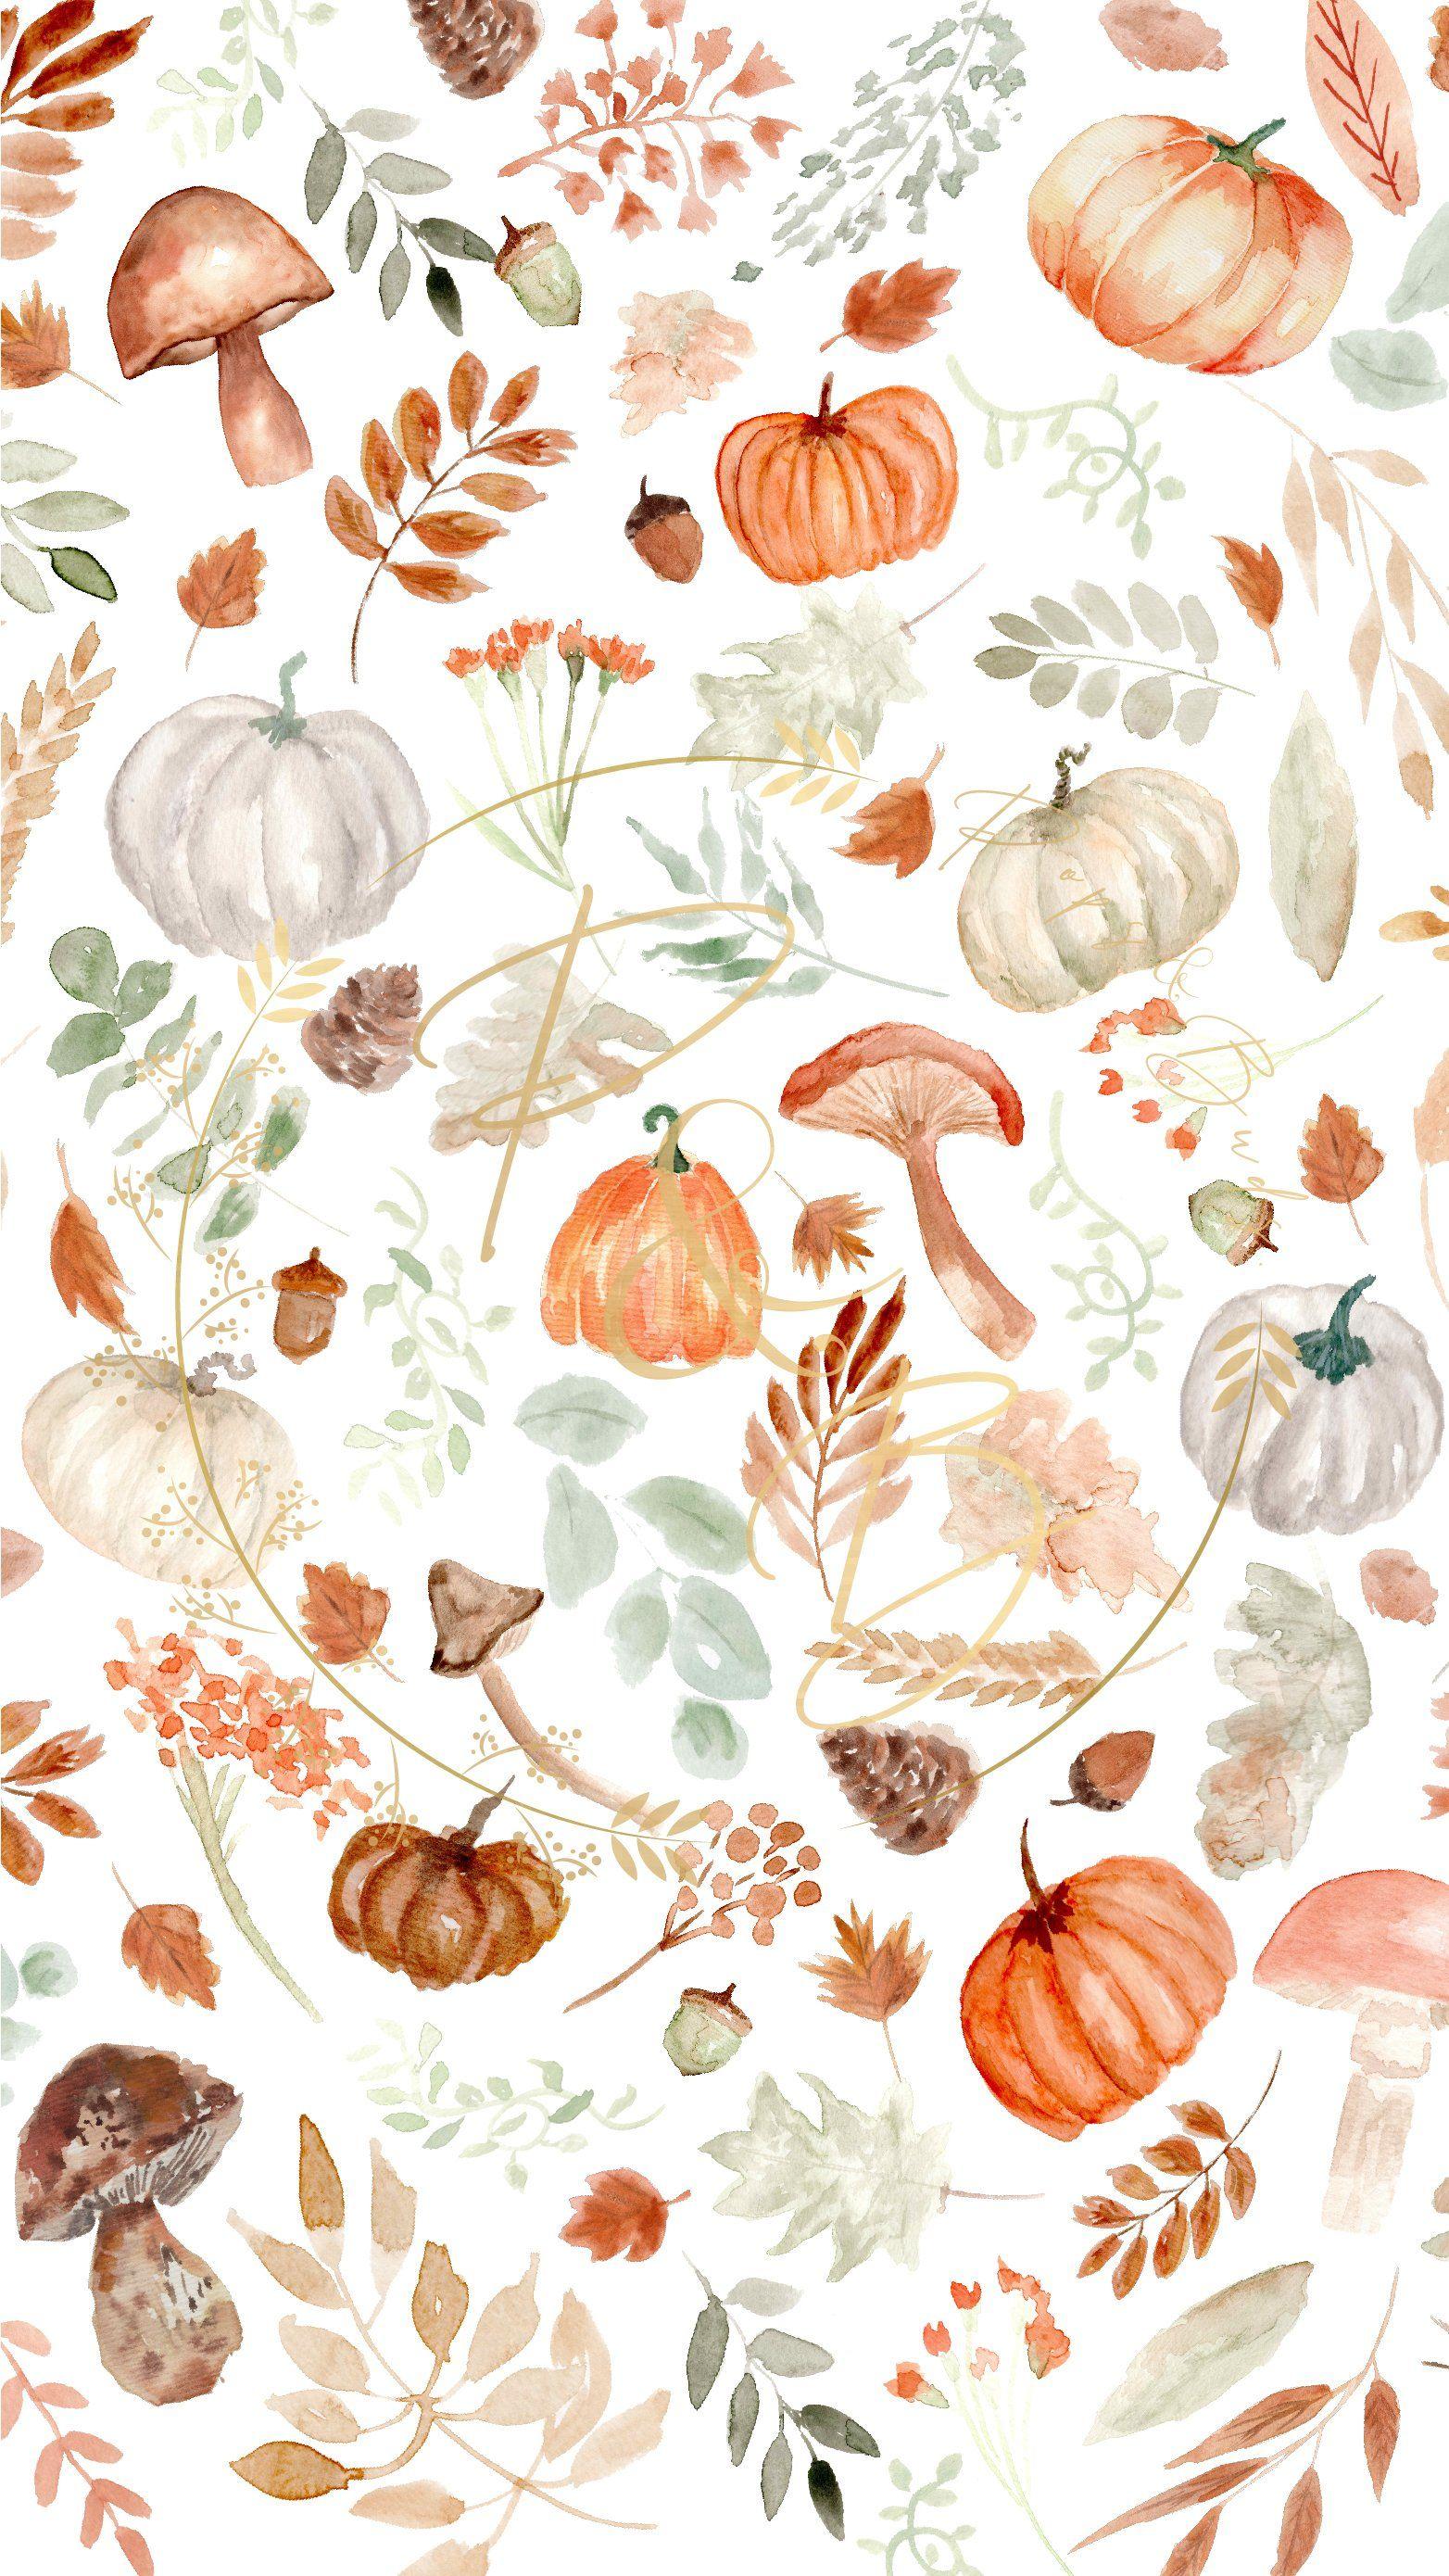 Pumpkin Patch Mobile Wallpaper Background | POPSANDBUDS